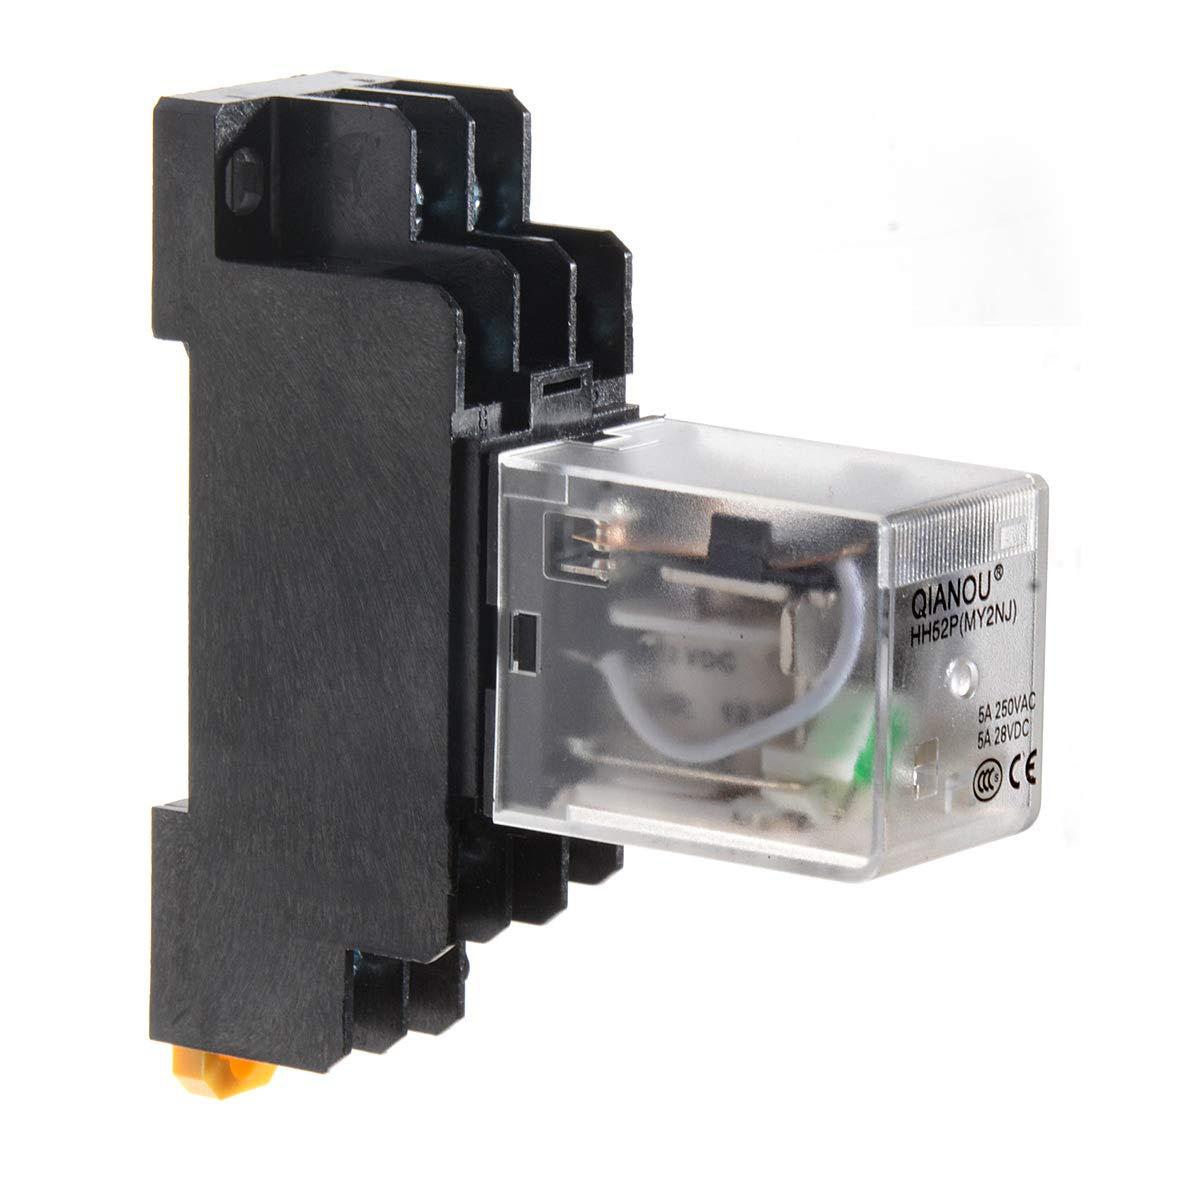 DC 24V YXQ DC24V Coil Electromagnetic Power Relay 8Pin DPDT Green Indicator Light HH52P w PYF08A Socket Base